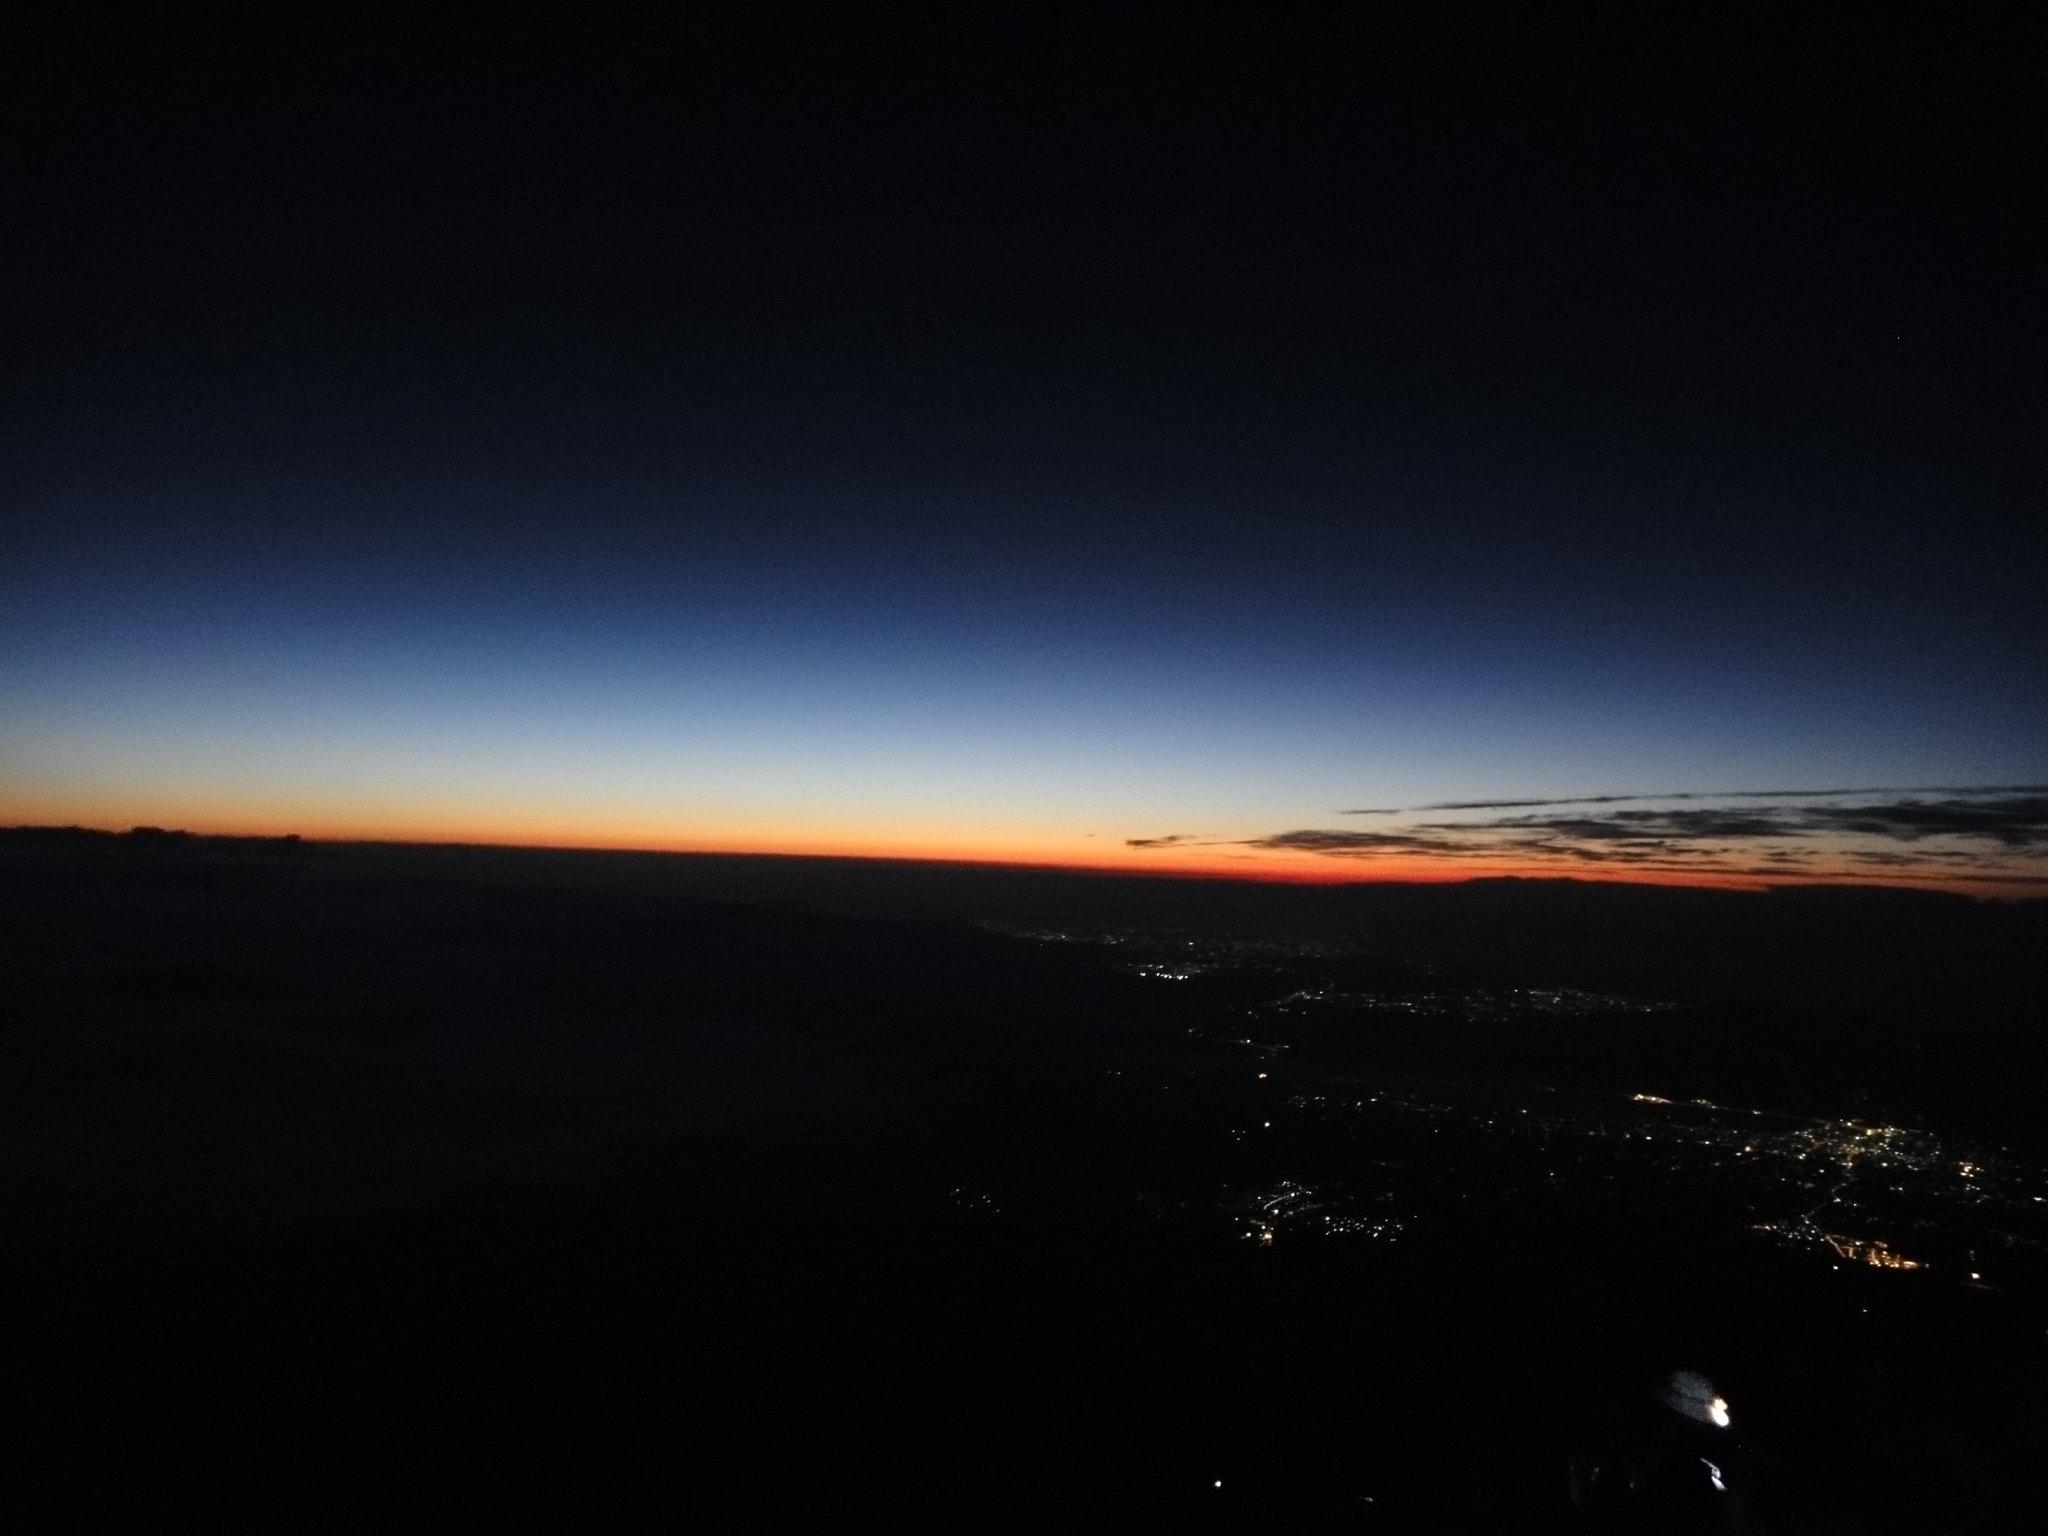 Mount Fuji - Soluppgång på gång